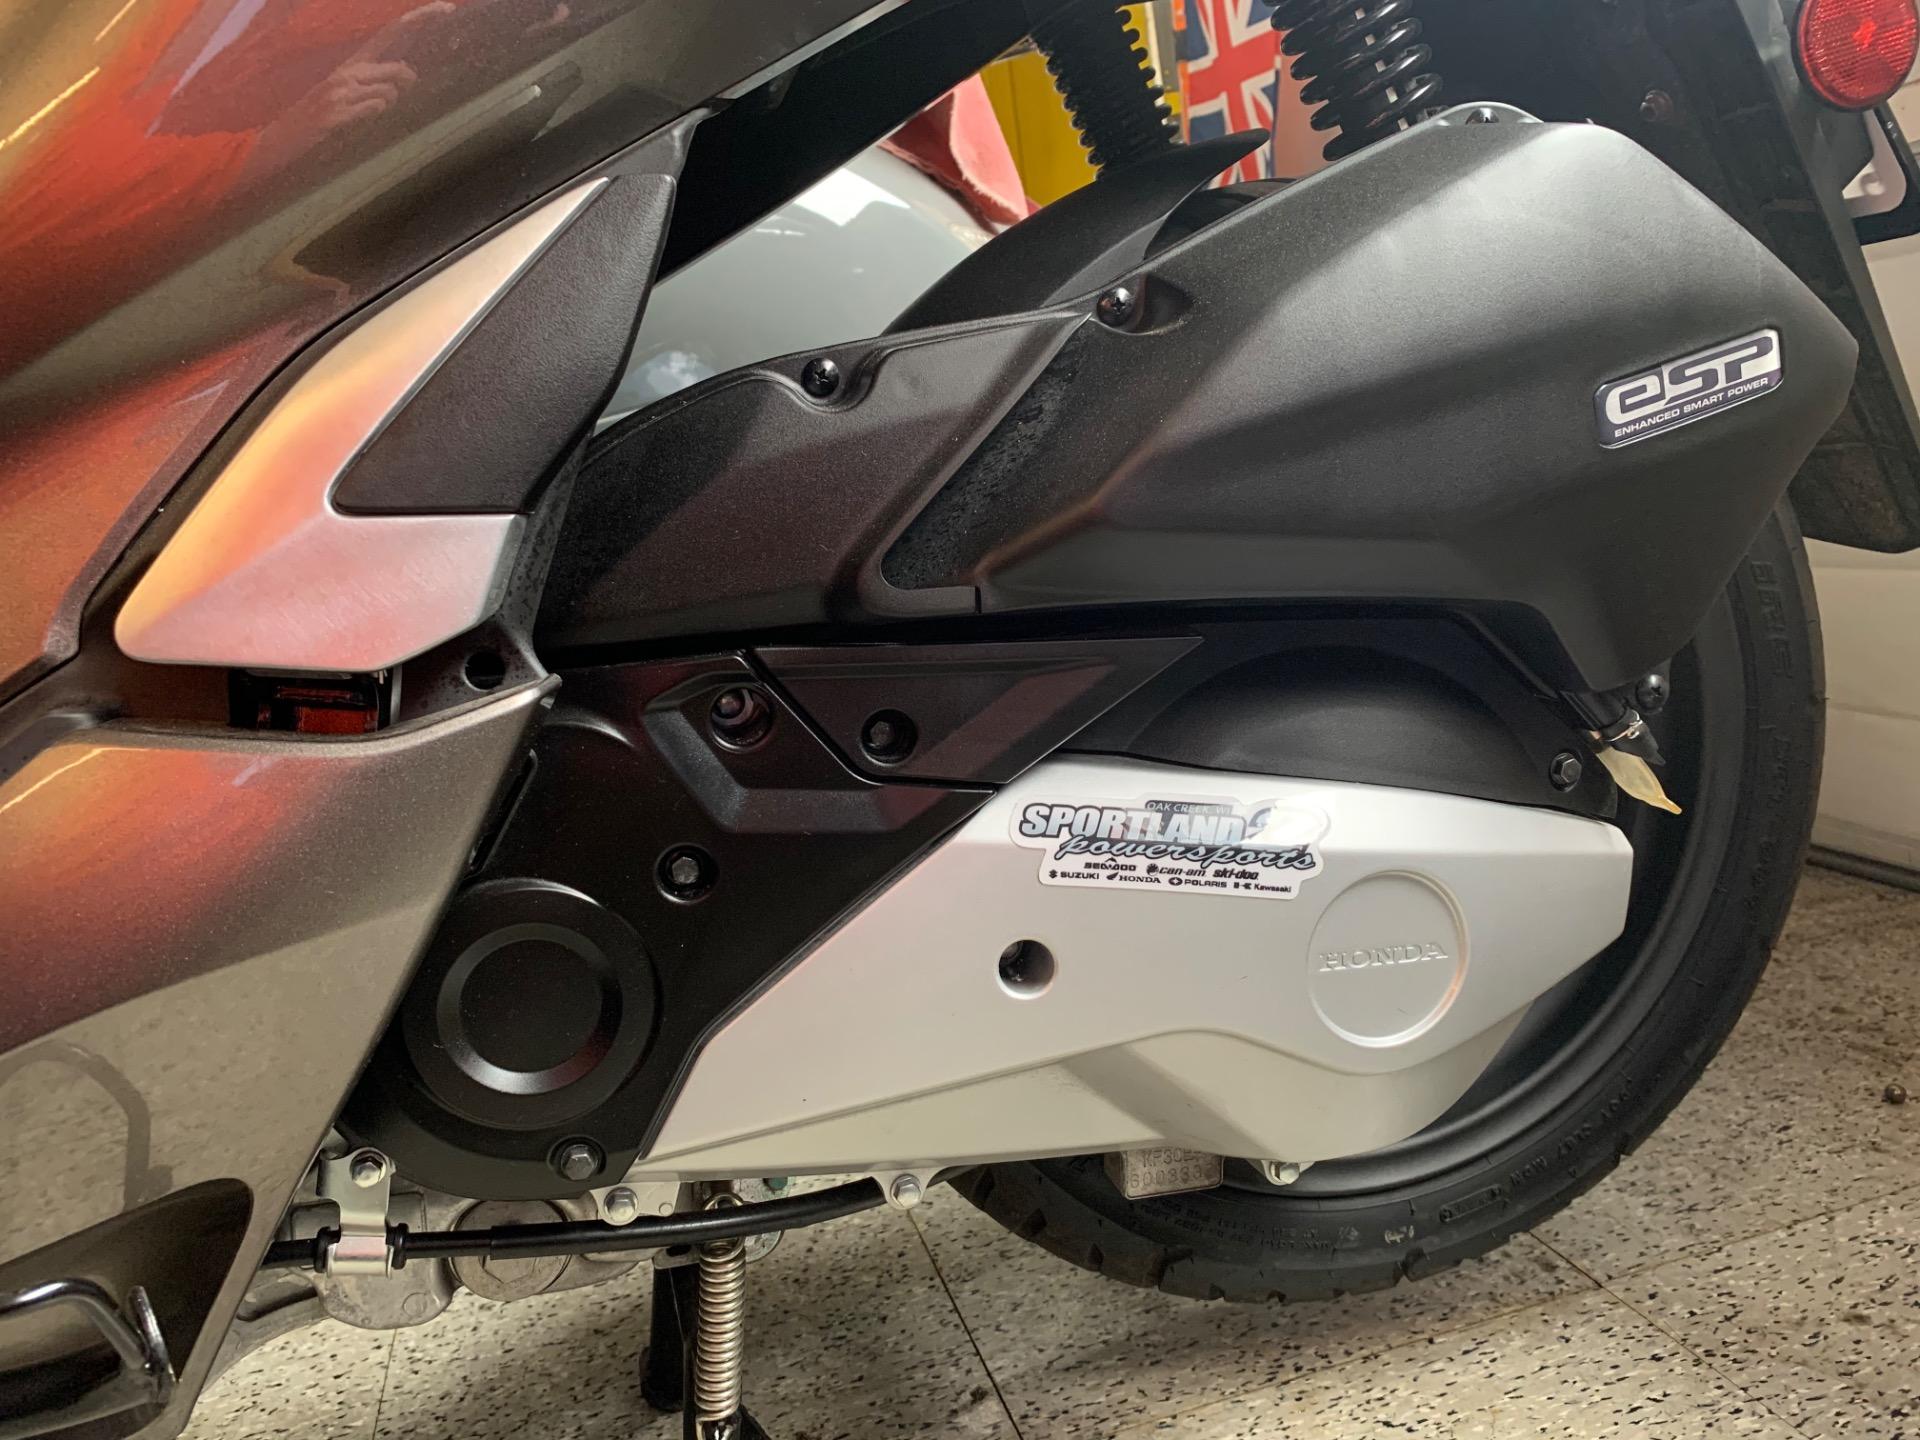 Used-2019-Honda-PCX-150